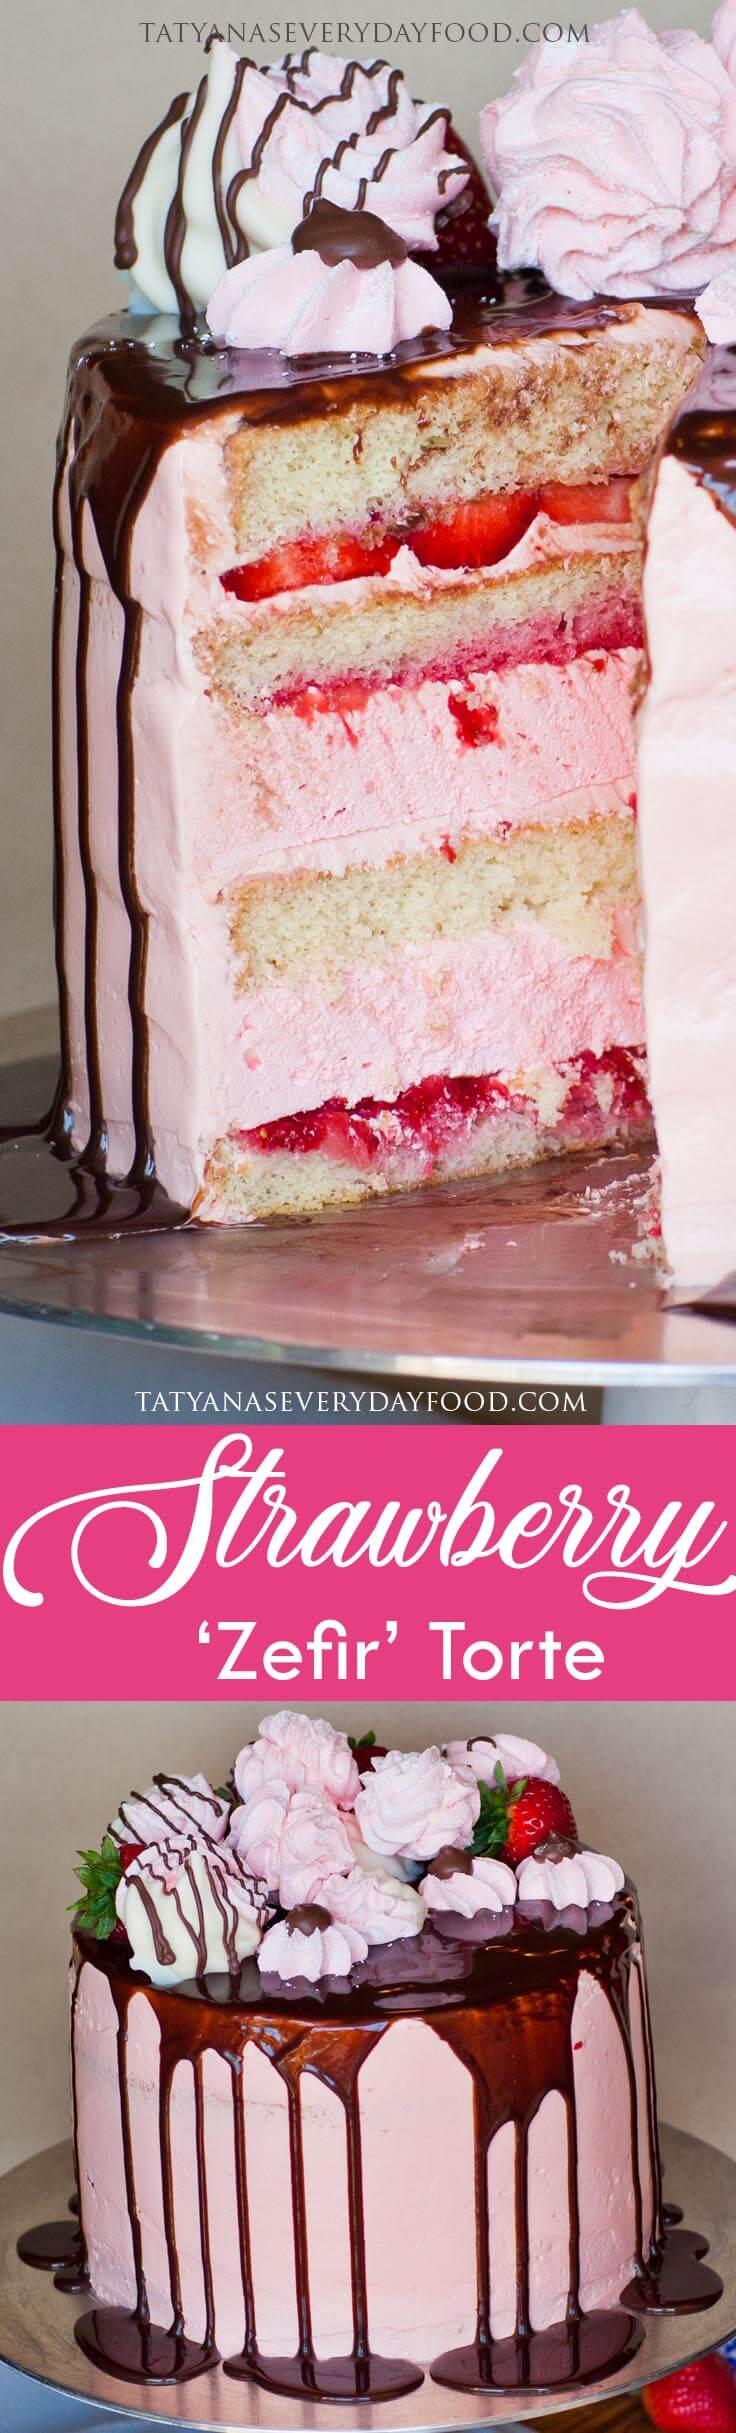 Strawberry Zefir Torte video recipe